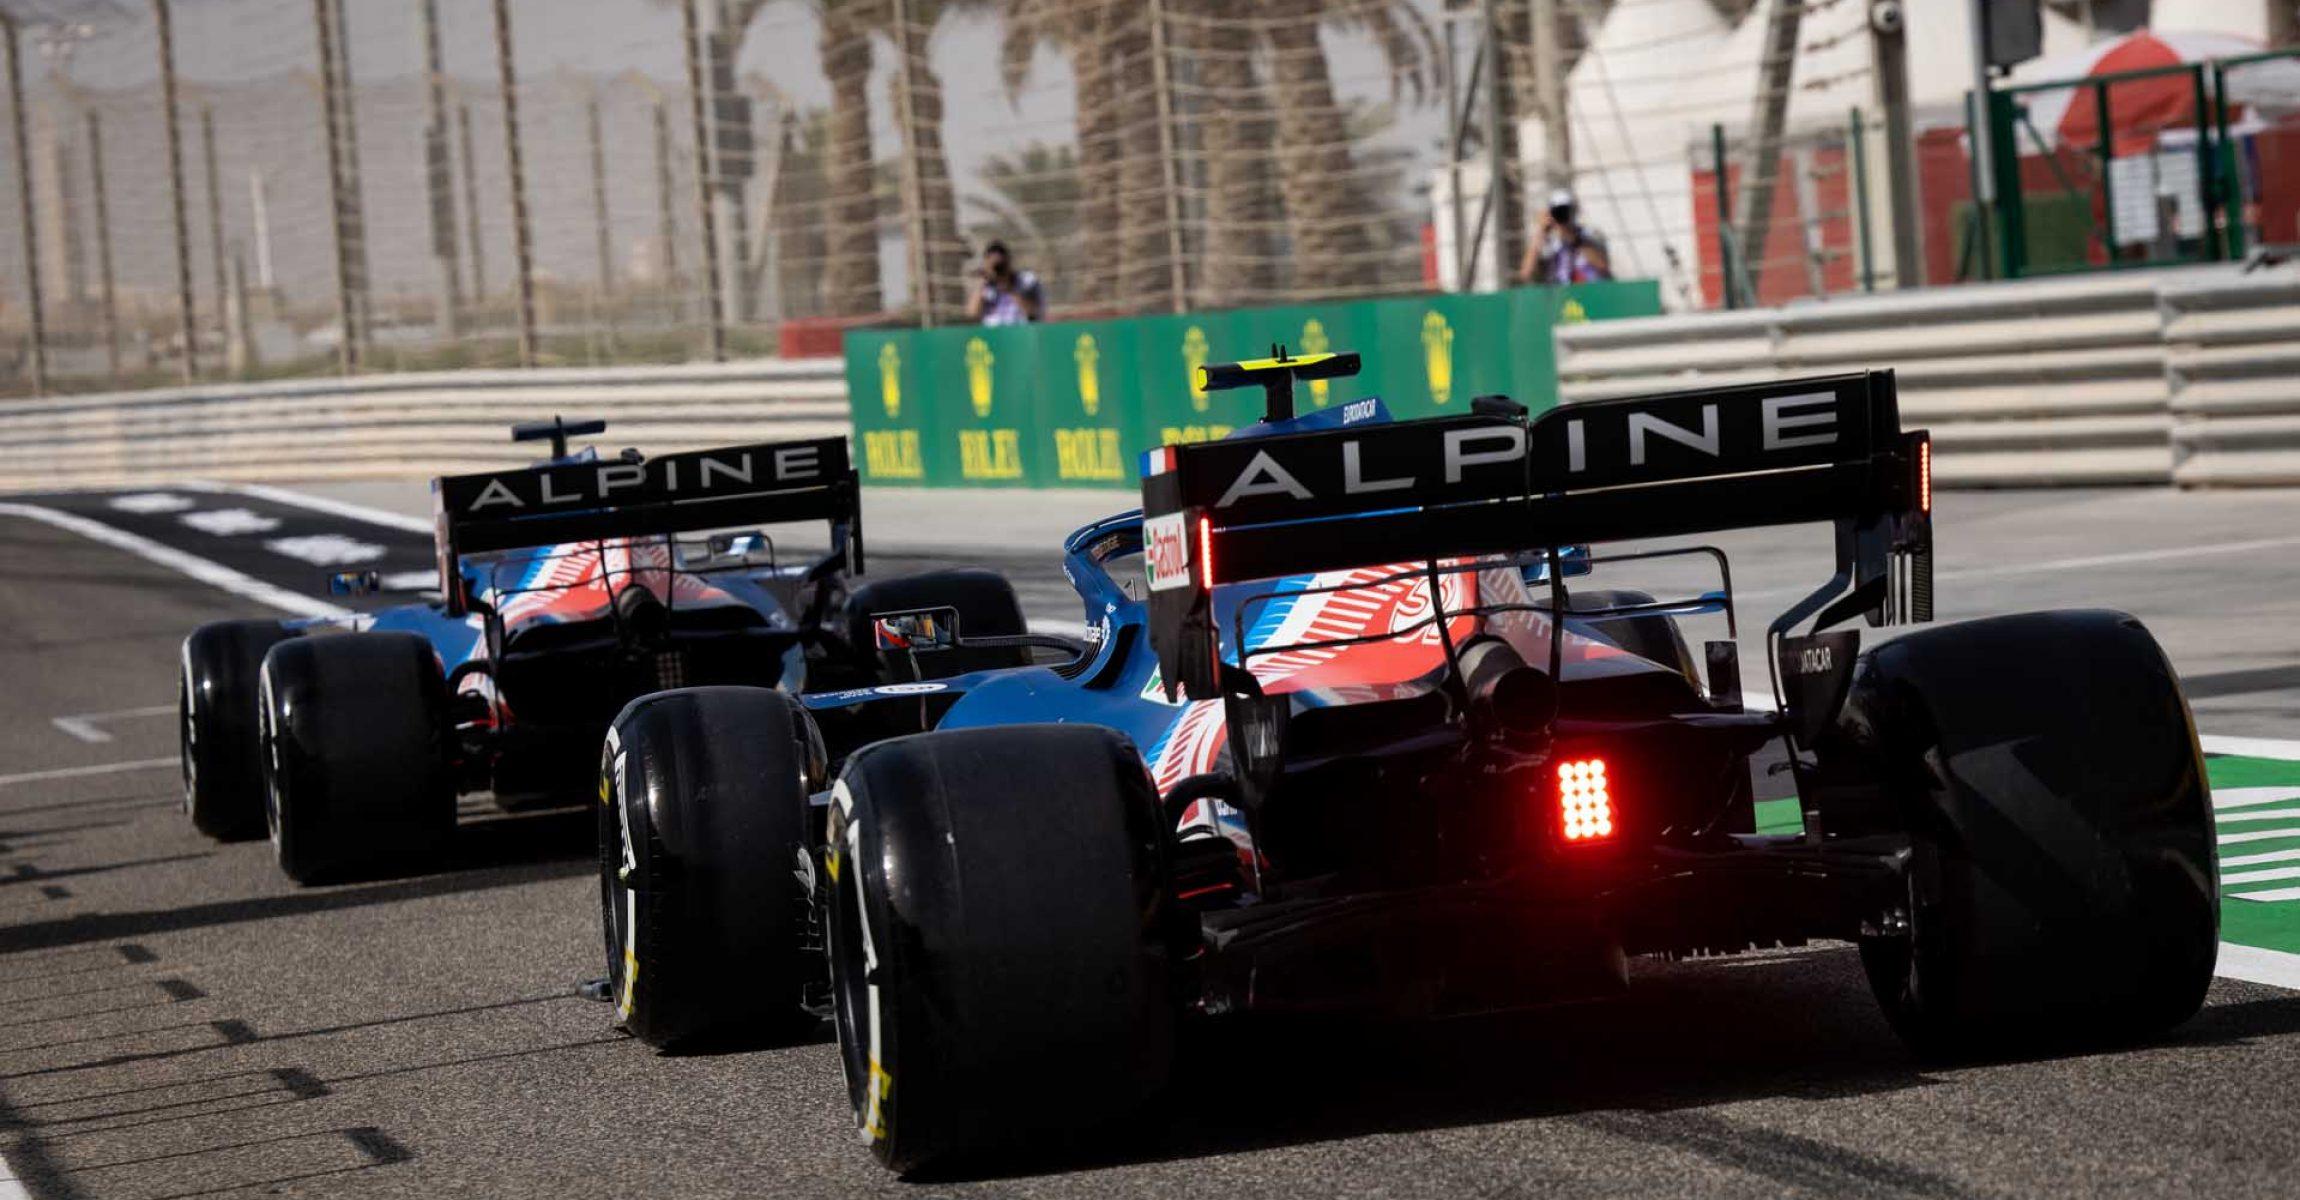 Fernando Alonso (ESP) Alpine F1 Team A521 and Esteban Ocon (FRA) Alpine F1 Team A521 leave the pits. Bahrain Grand Prix, Friday 26th March 2021. Sakhir, Bahrain.